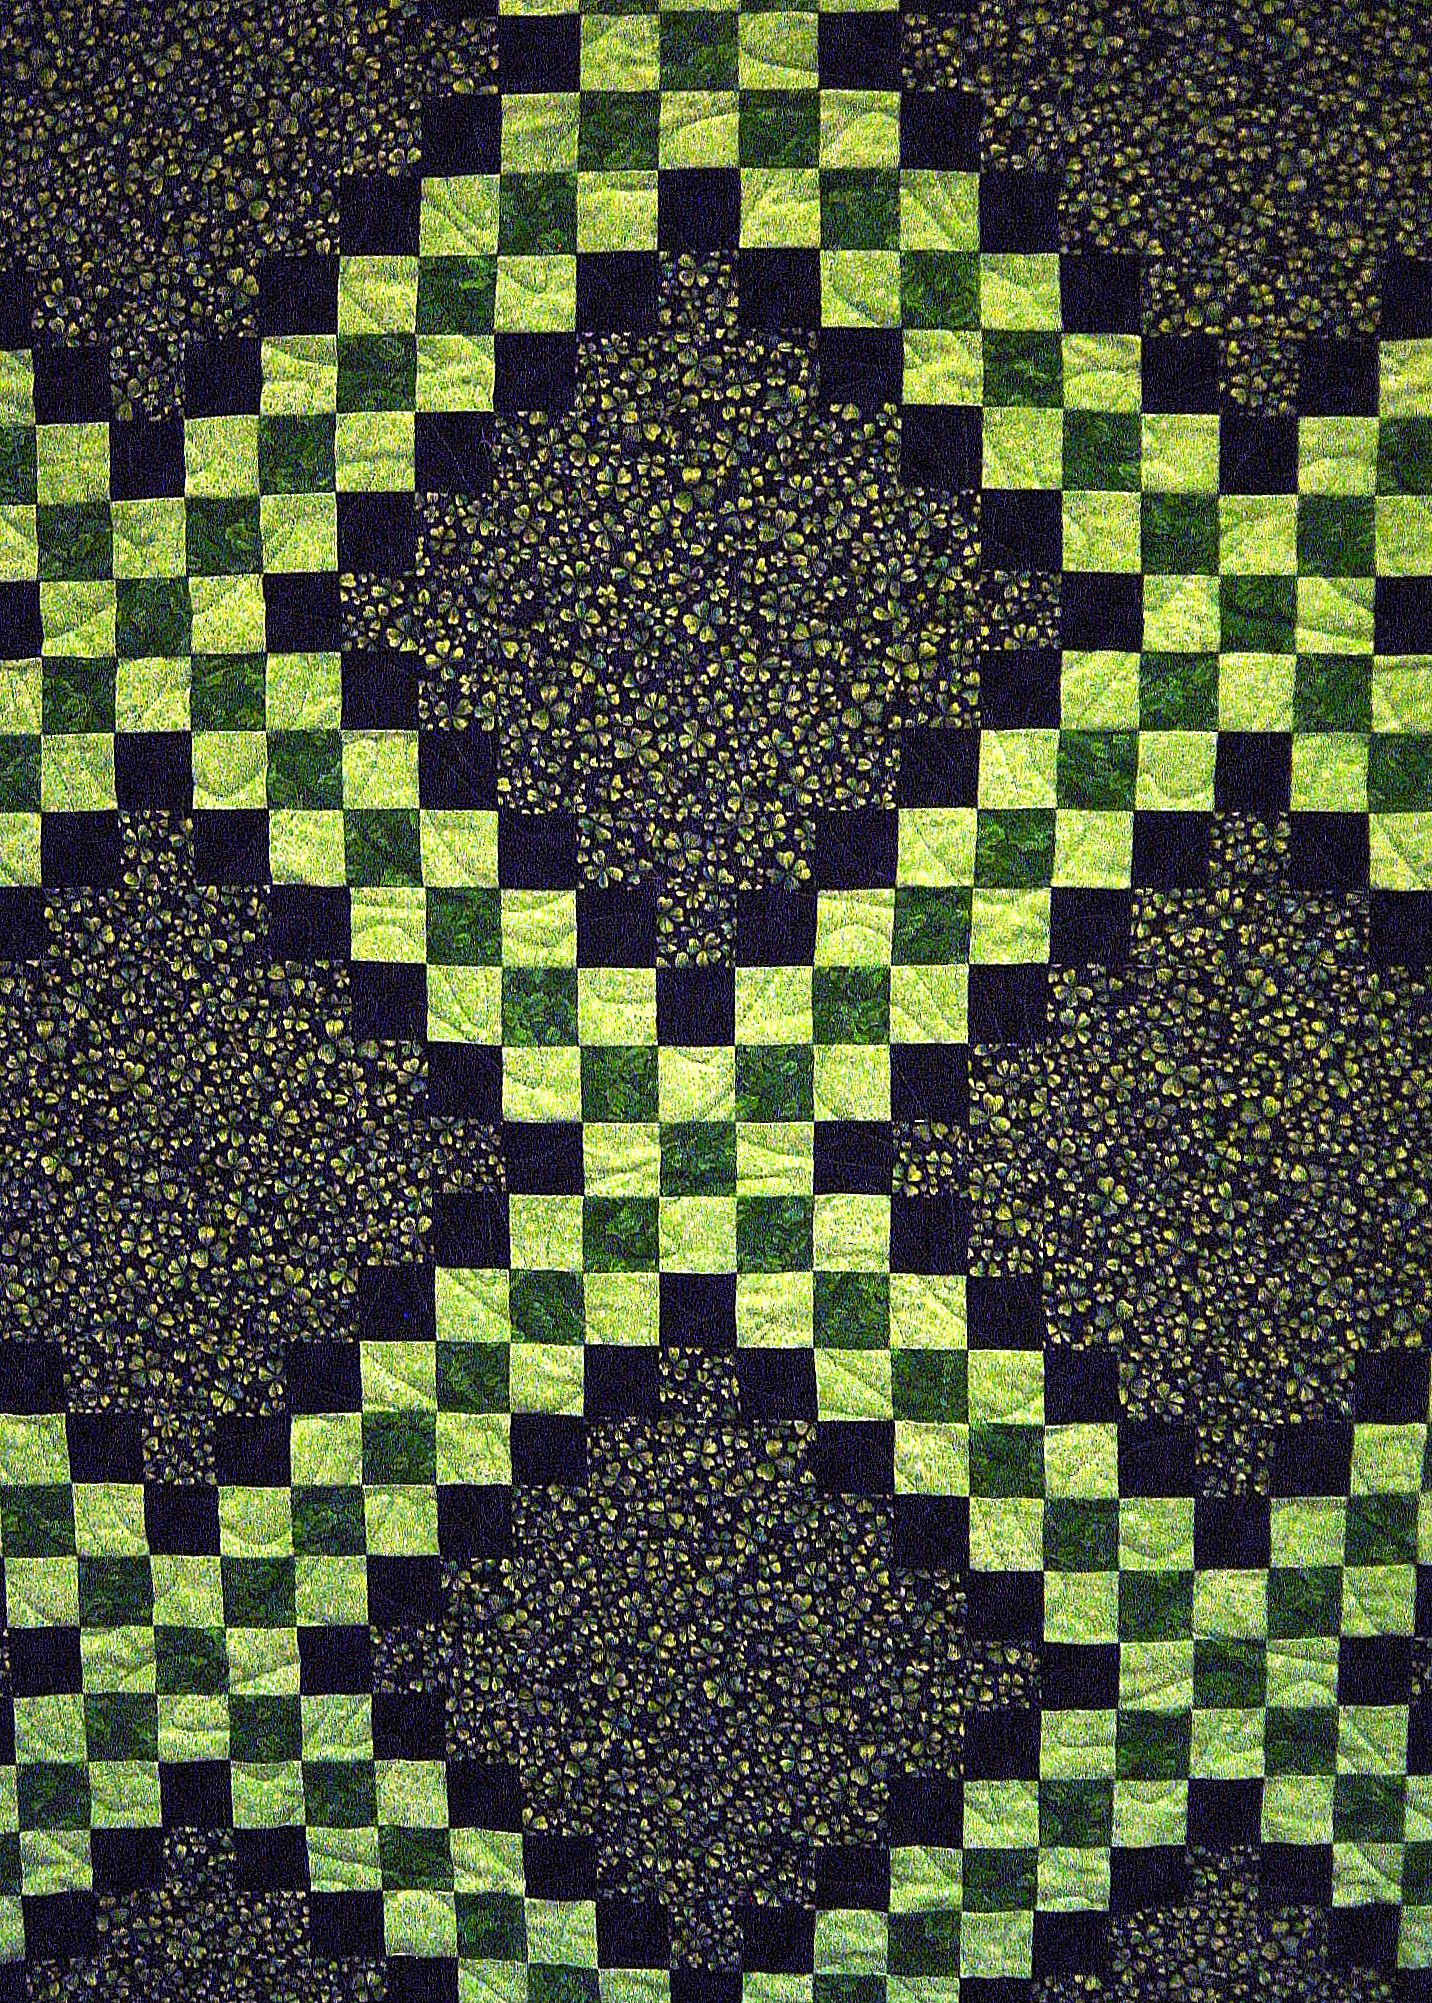 Pin by Loretta Yerbich Aymond on Quilts Pinterest